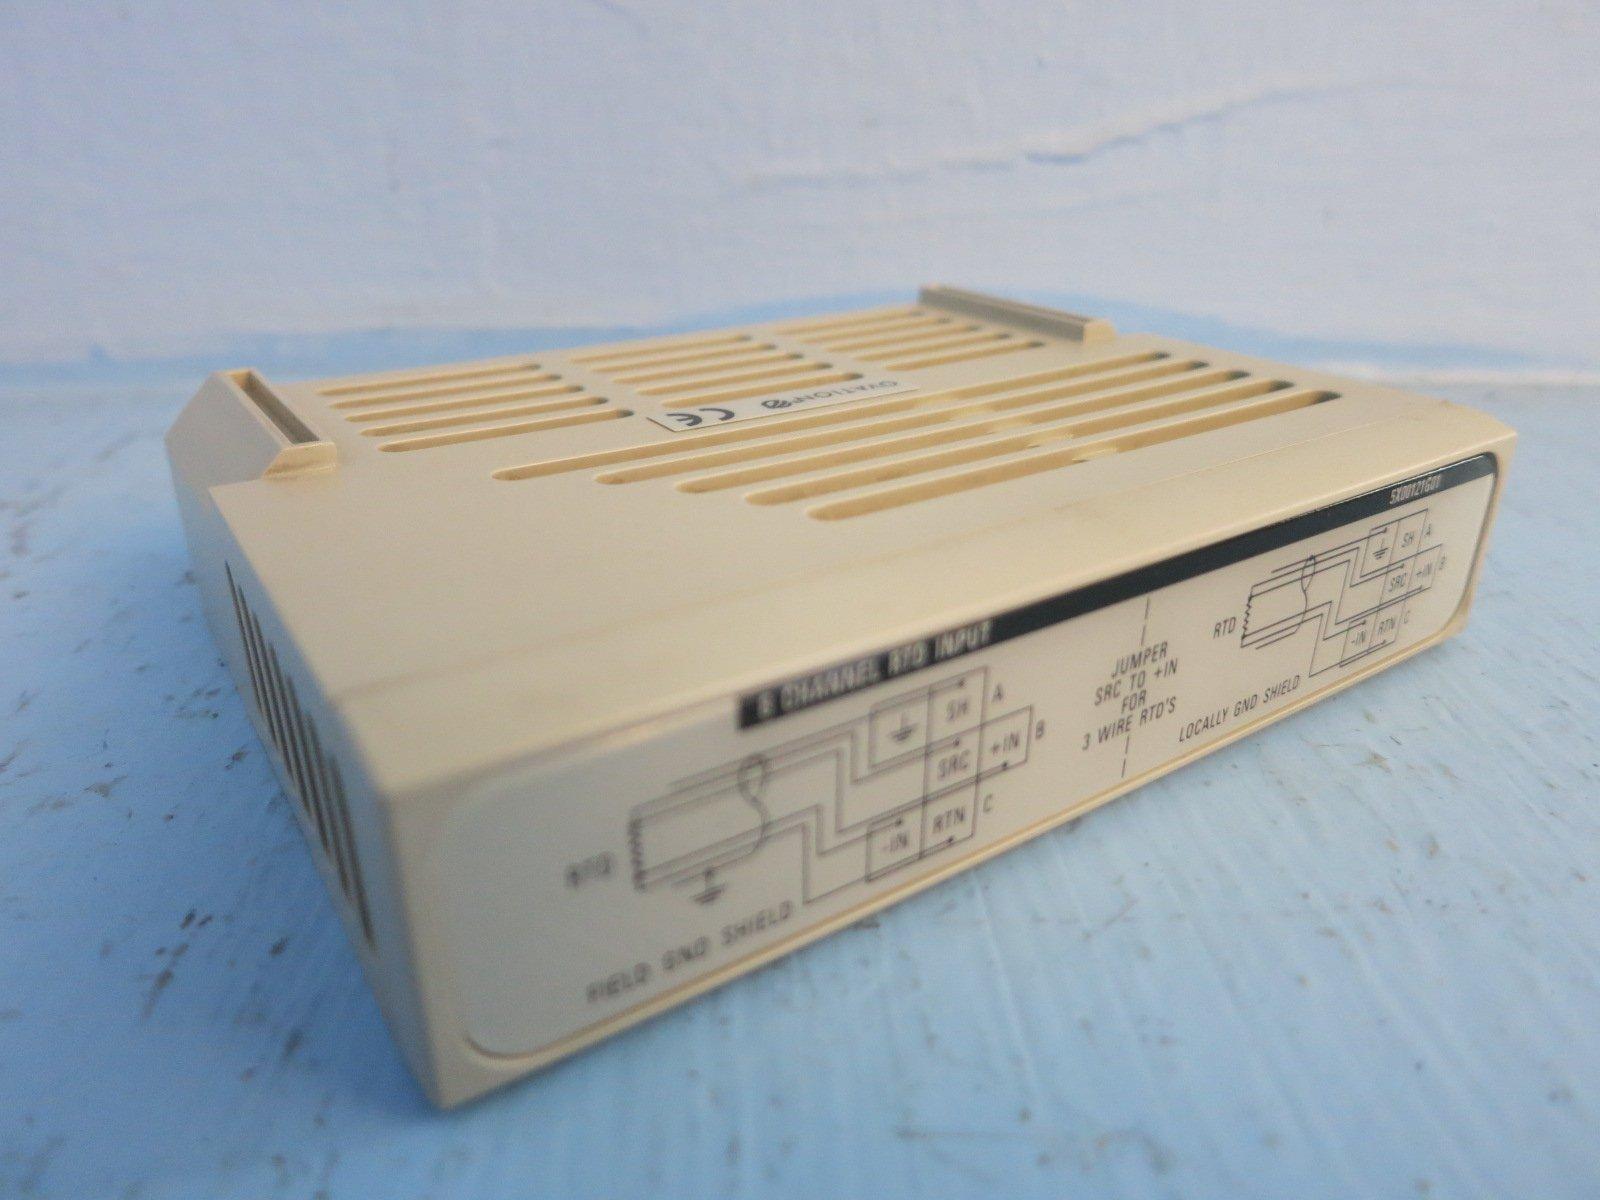 5X00119G01 Ovation RTD Input 8 Channel Module